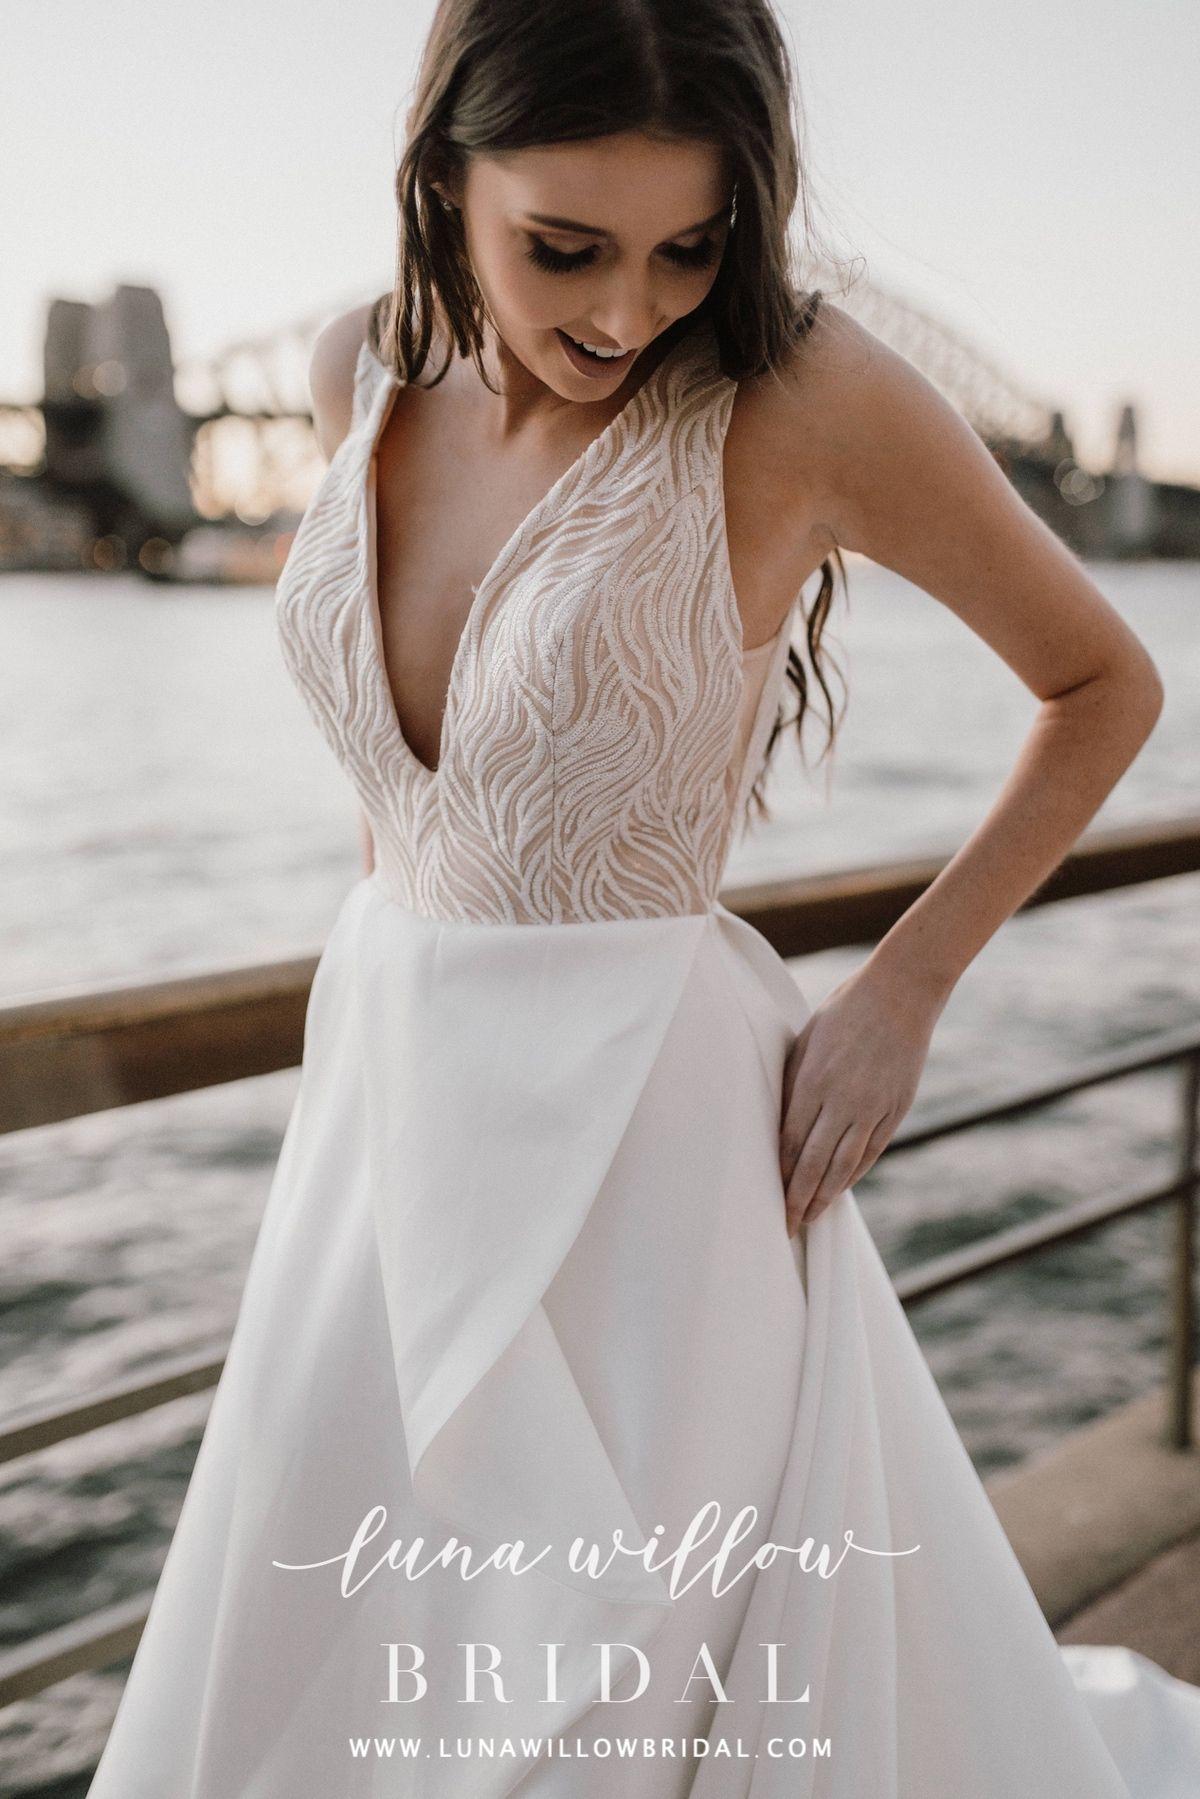 Sydney Designer wedding gowns, Beautiful wedding gowns